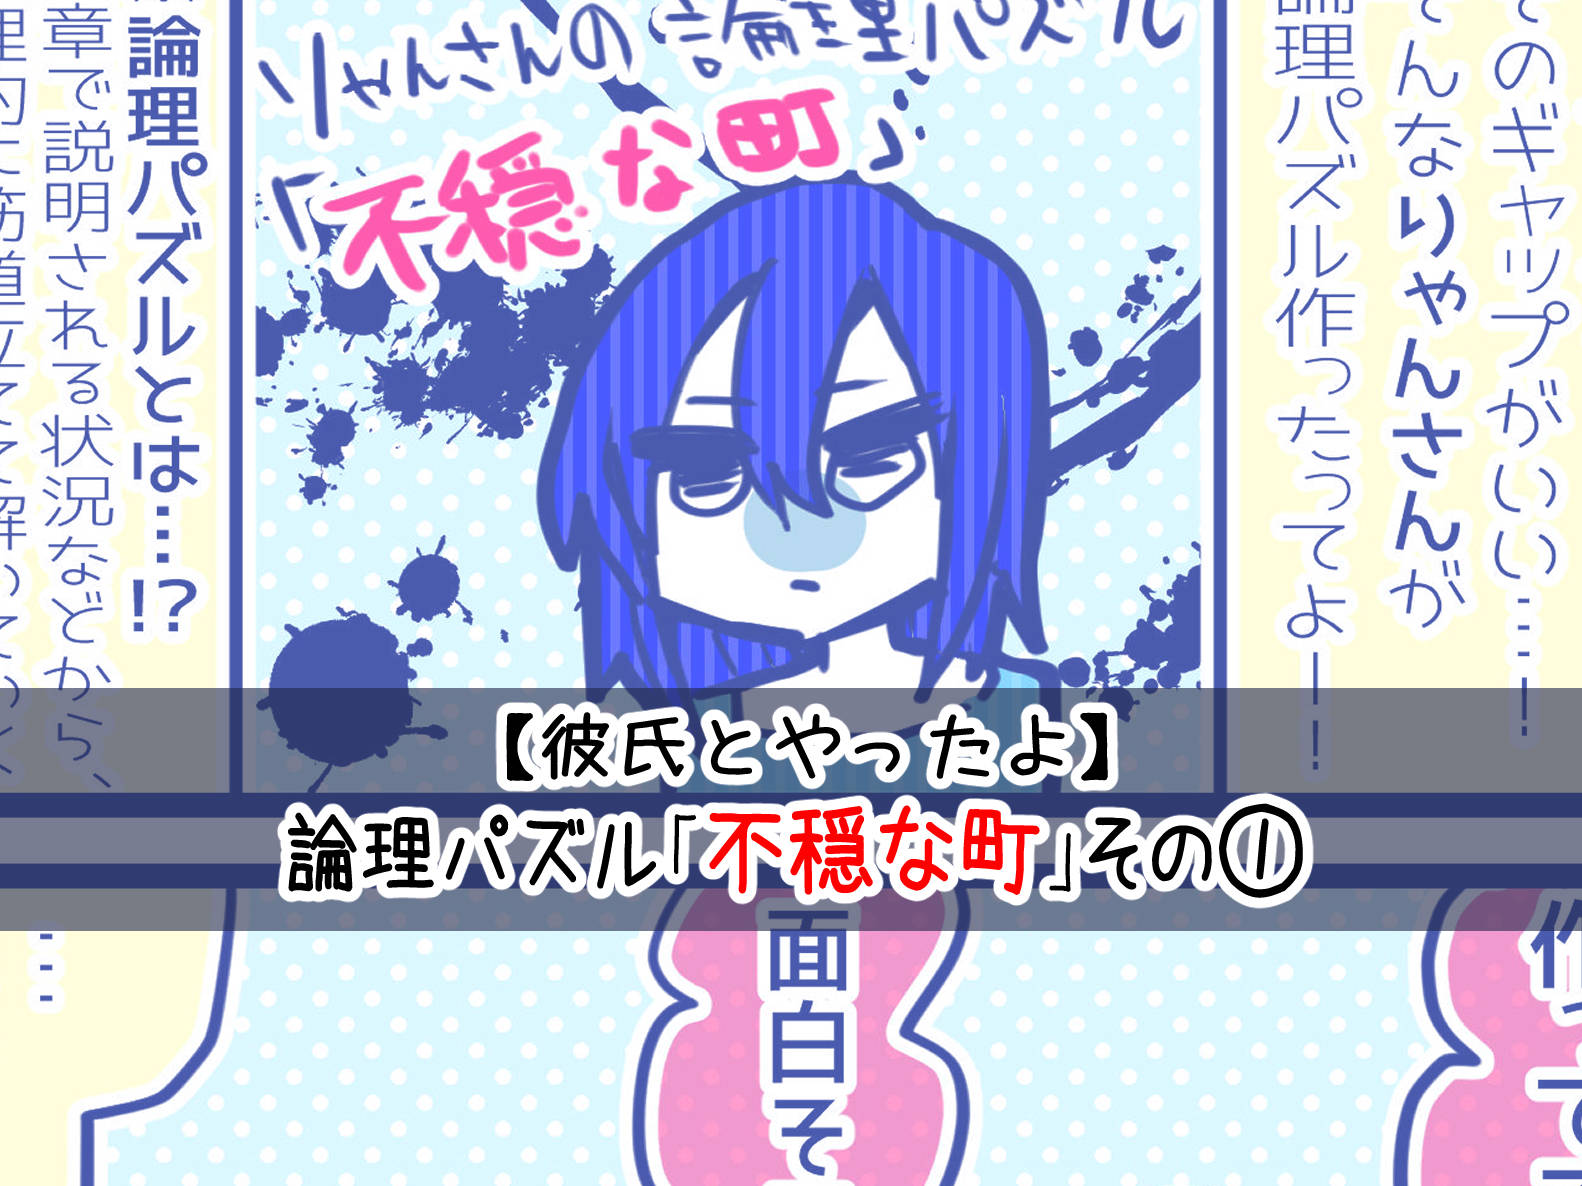 neetsadami.com_20話サムネ